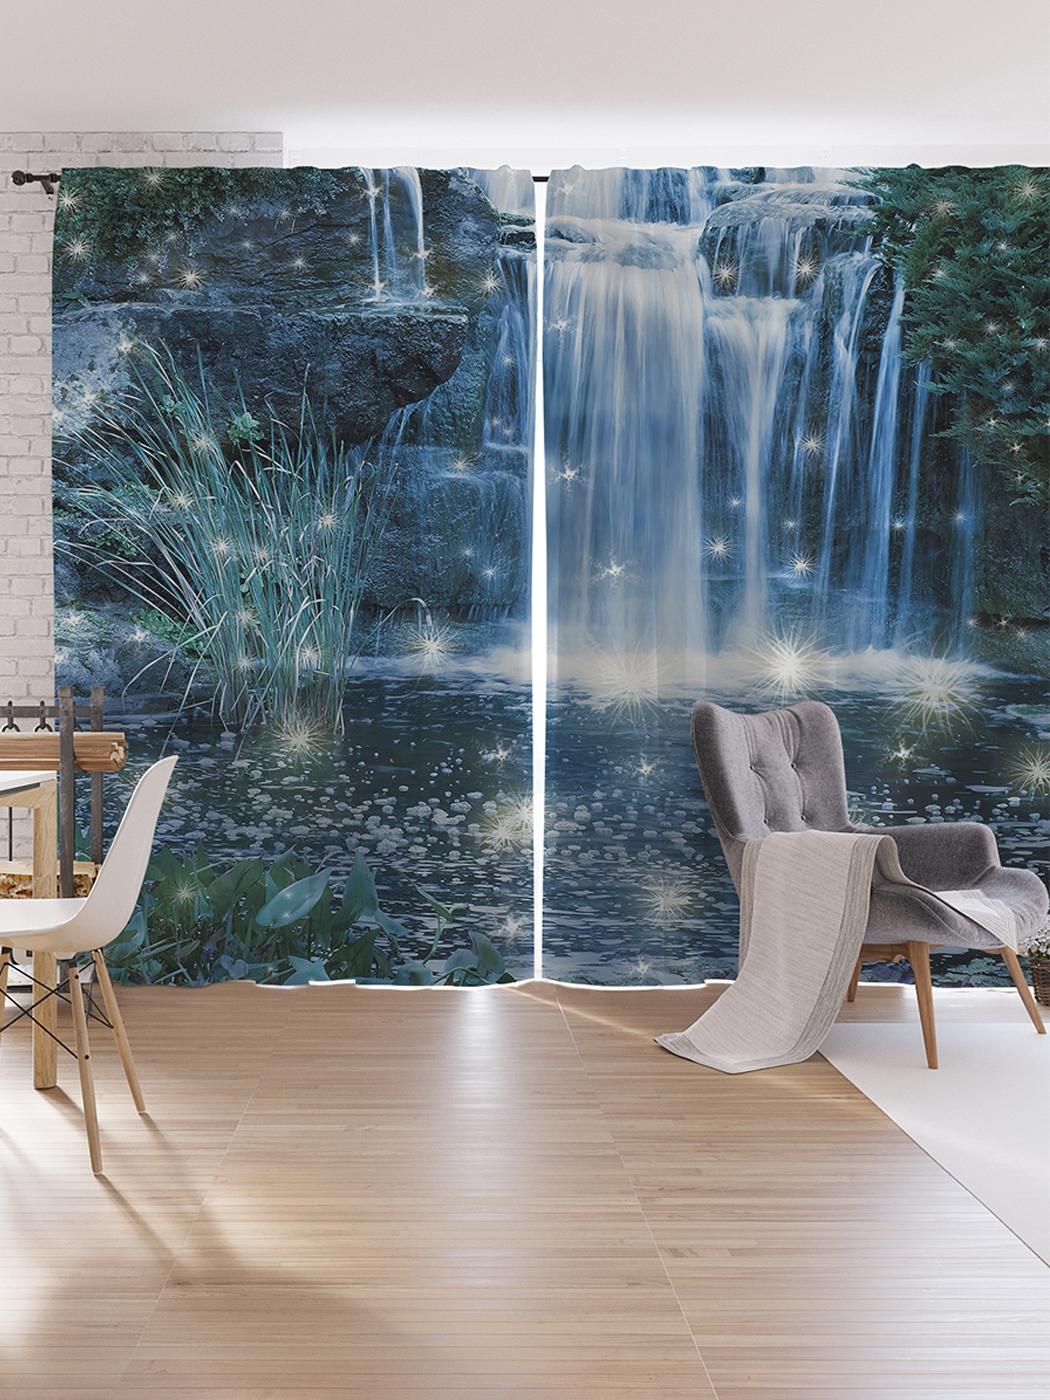 Шторы под лён JoyArty «Волшебство на водопаде», серия Oxford DeLux, 340х265 см фото